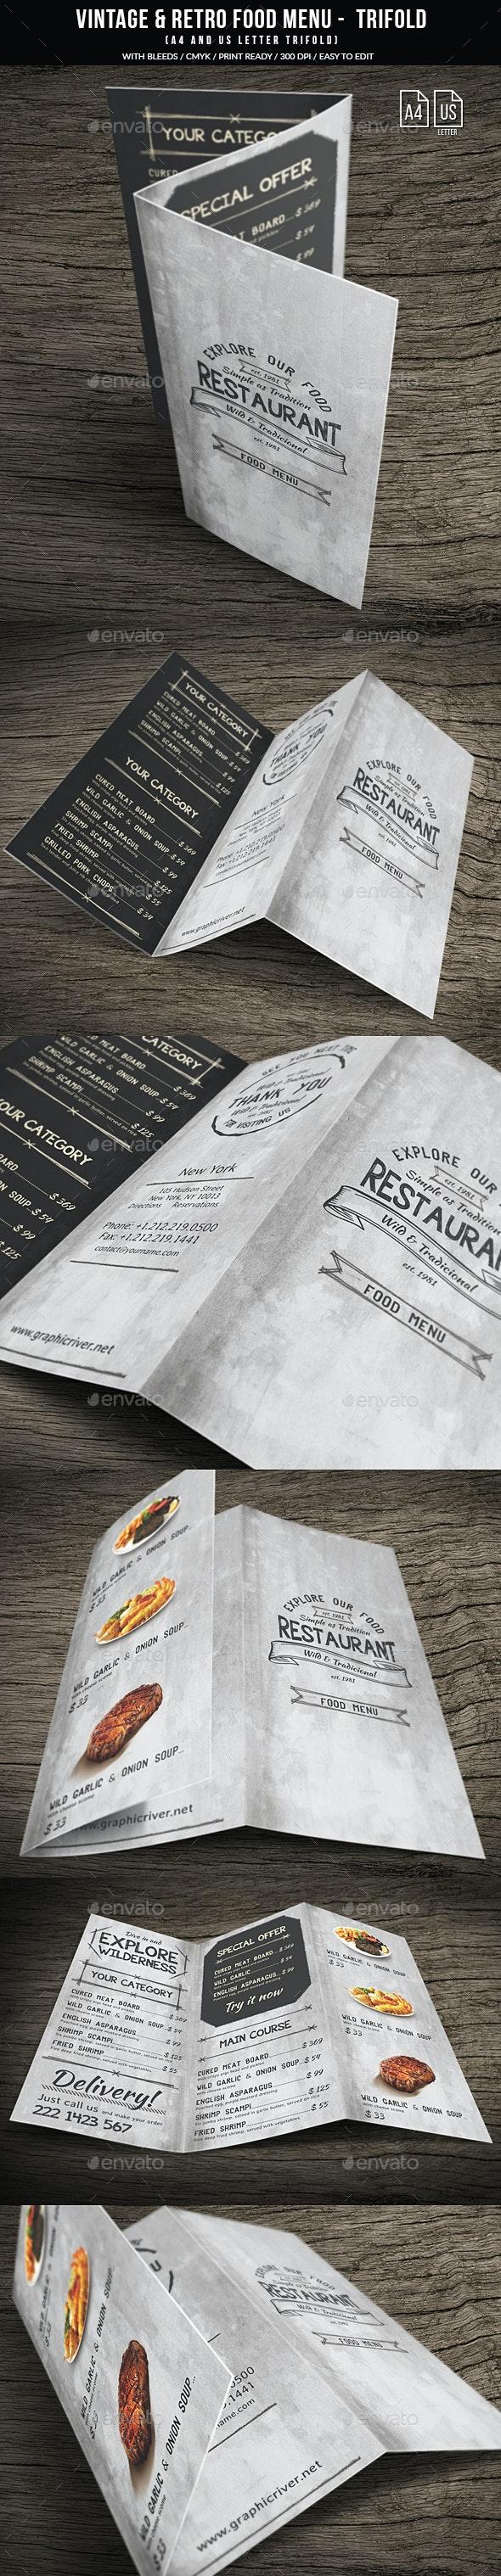 Vintage And Retro Trifold Menu A4 & US Letter - Food Menus Print Templates